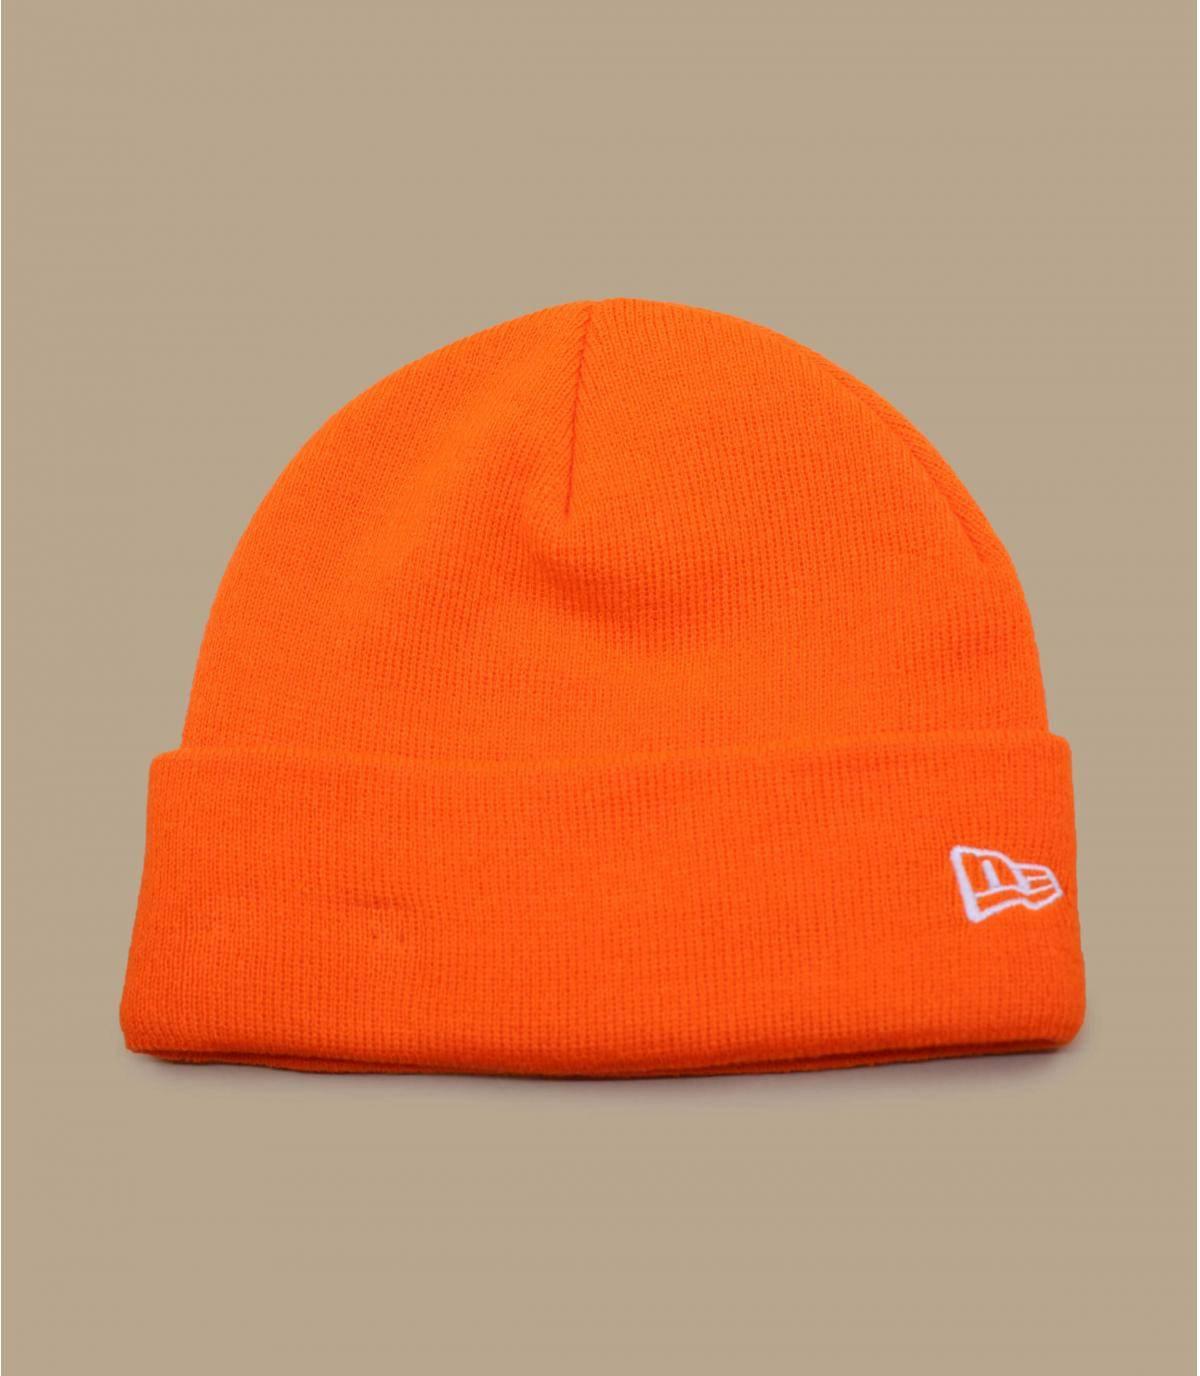 Detalles Pop Short Cuff orange imagen 2